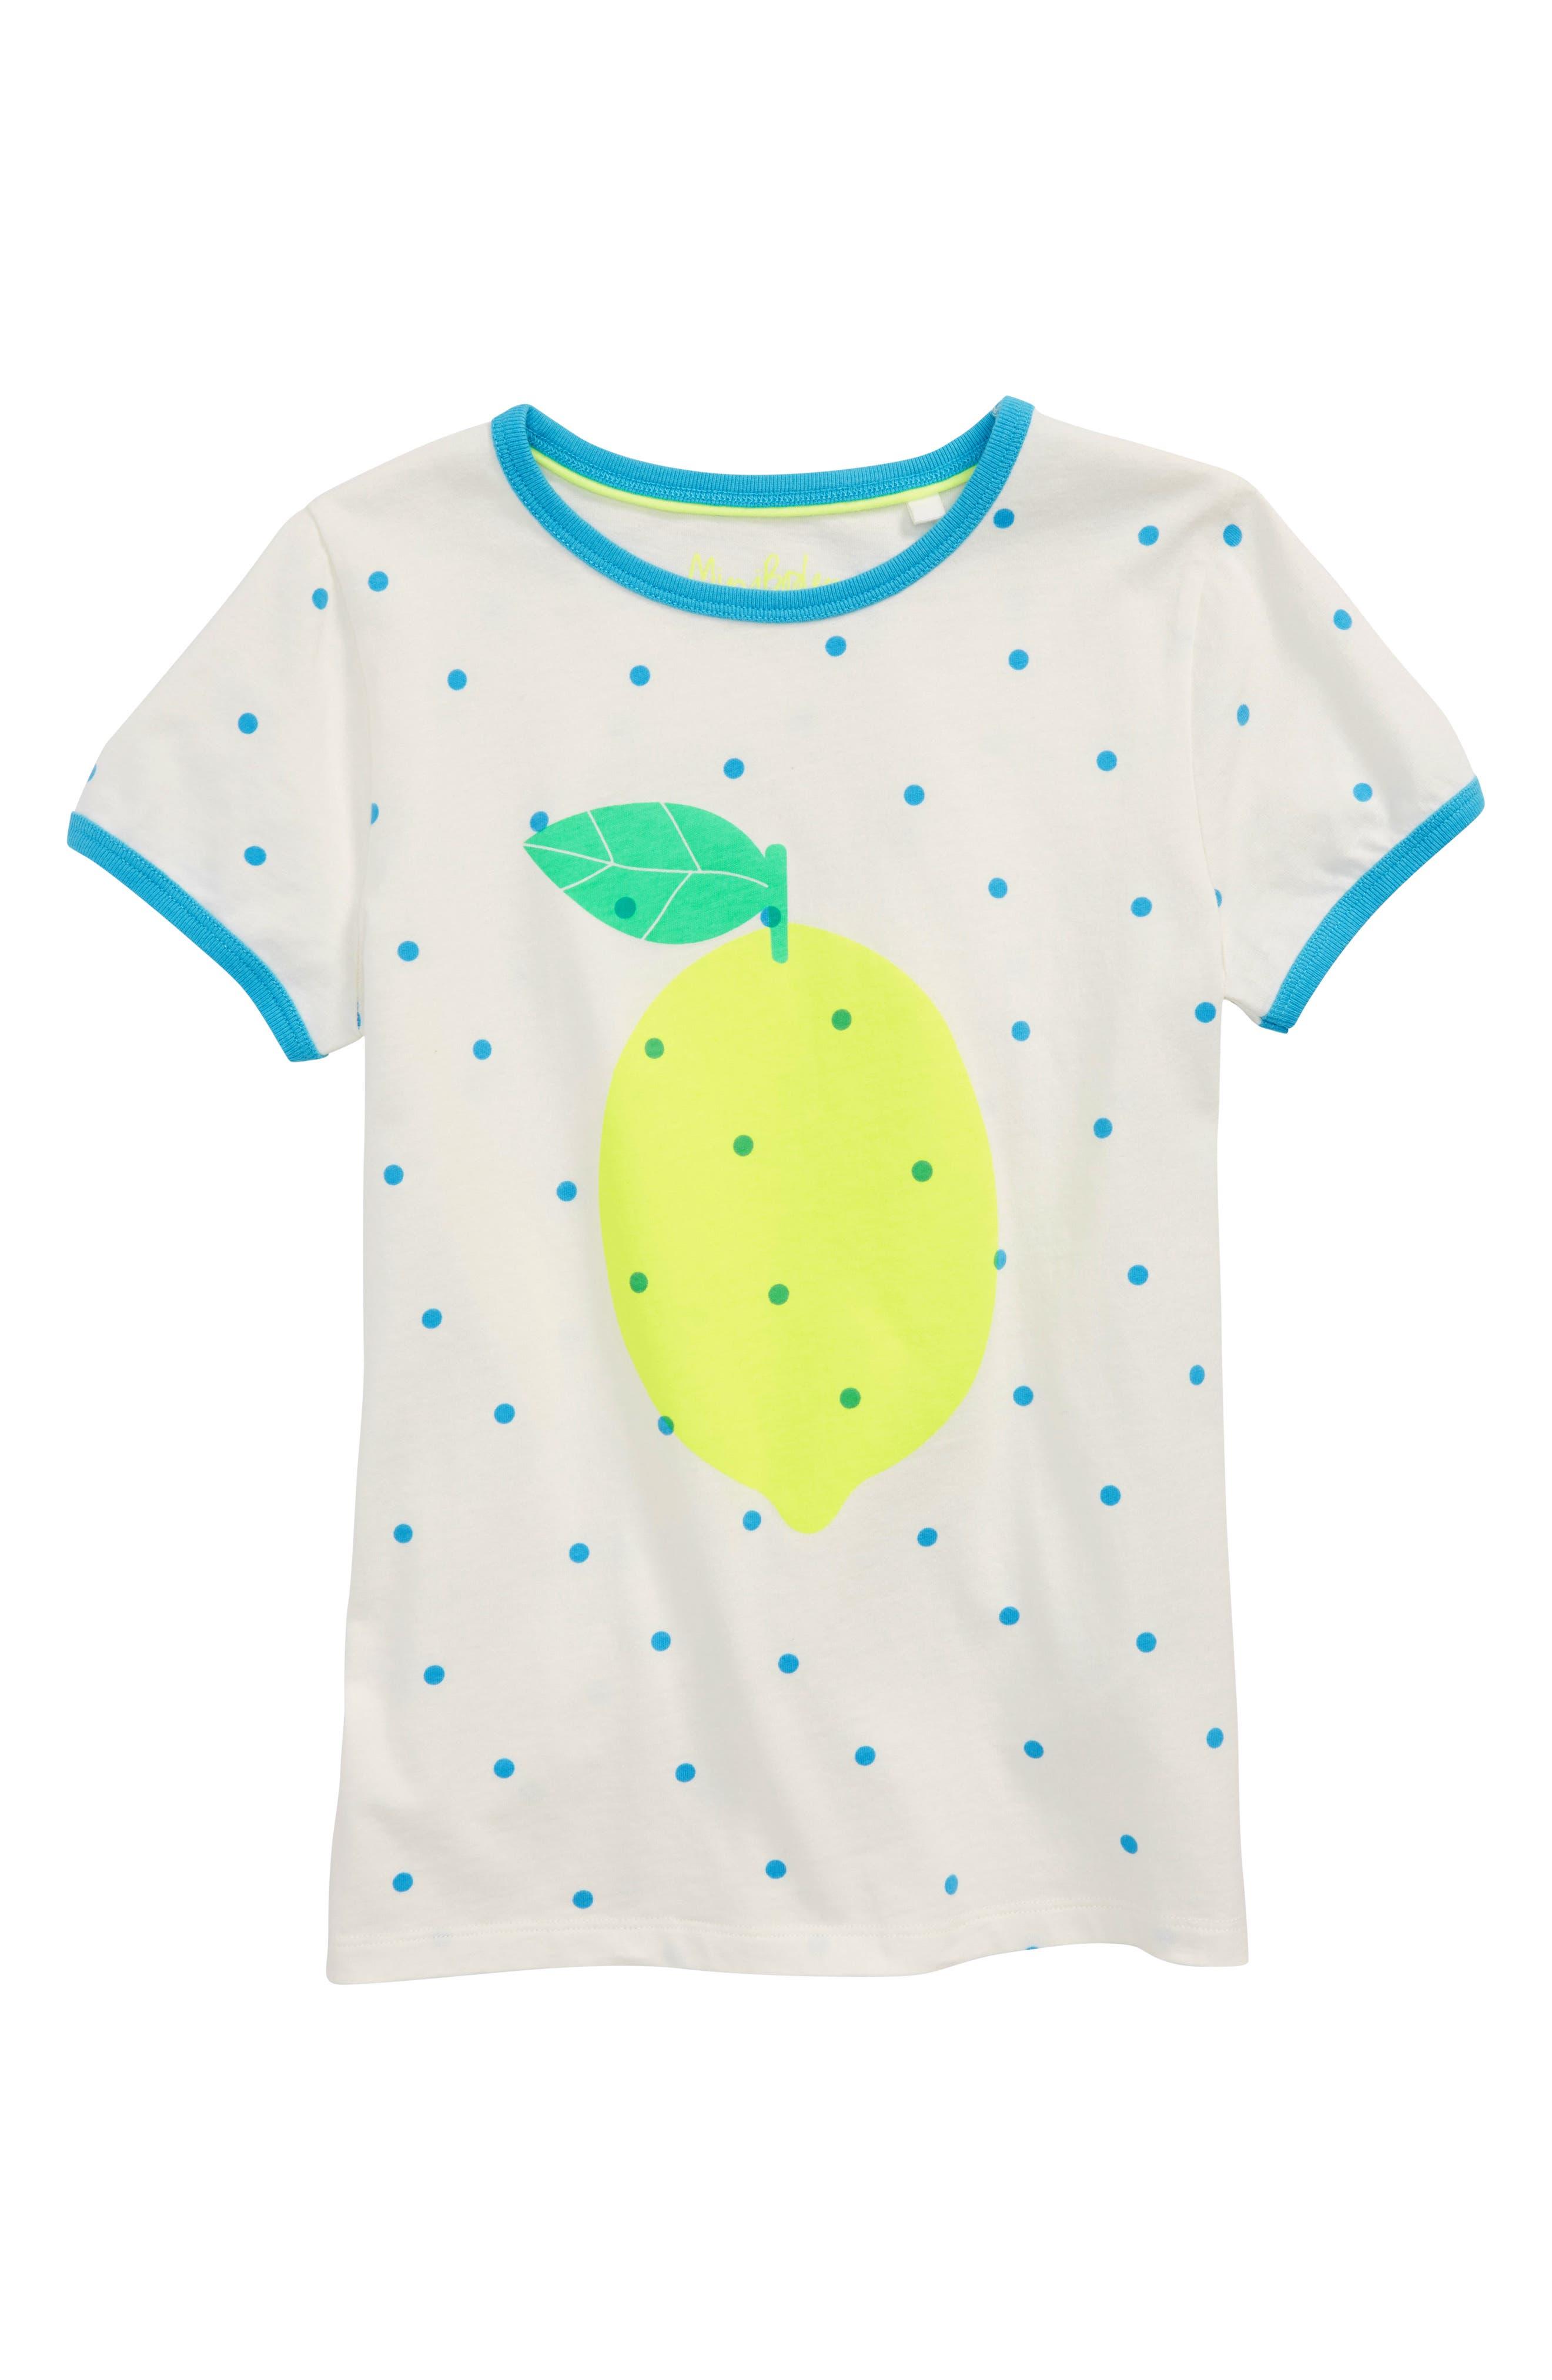 Bright Lemon Tee,                             Main thumbnail 1, color,                             Ivory/ Sail Confetti Spot Ivo